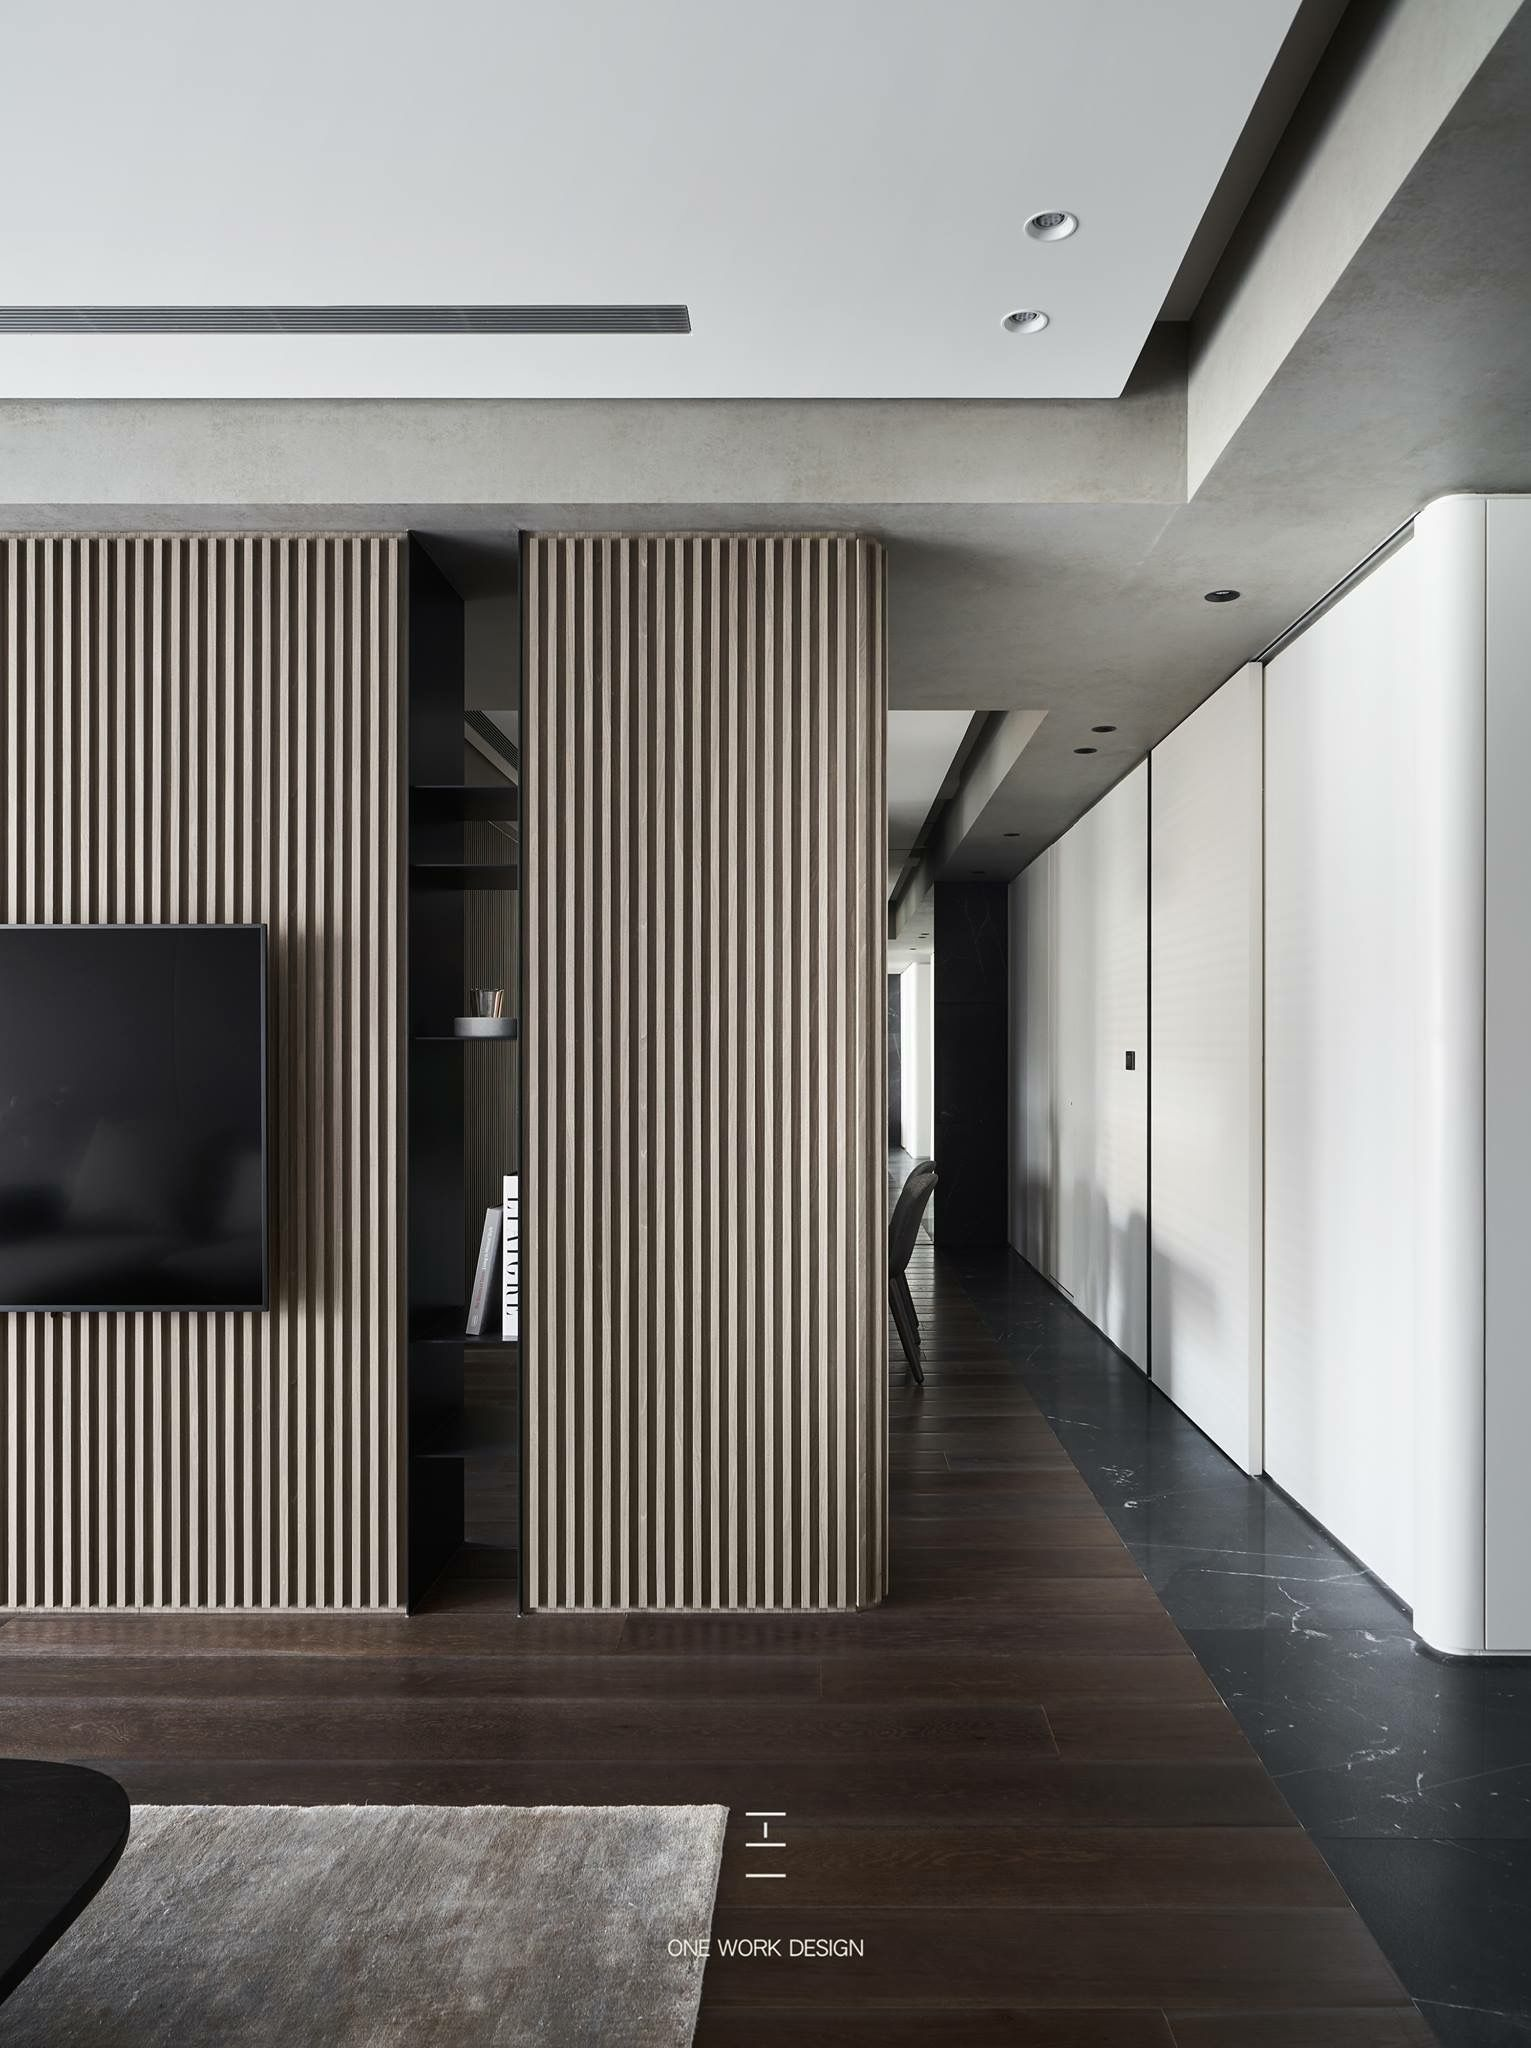 Interior Design Tv Room: Interior By One Work Design